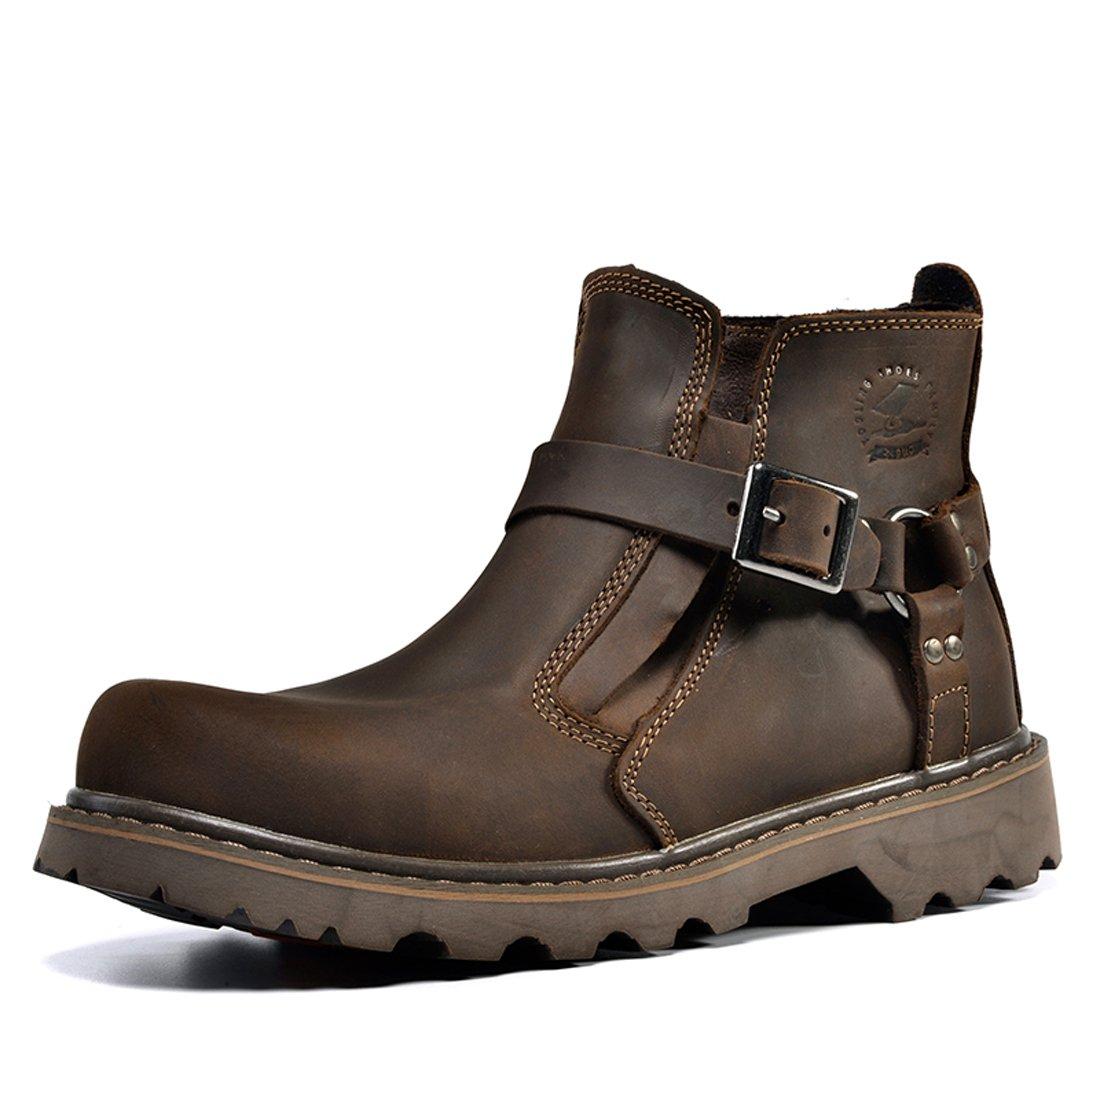 Z.SUO Men Women Unisex Couple Leather Two Wear Fashion Boot B06XTQ9TCX US Women:10,Men:8.5|Dark Brown